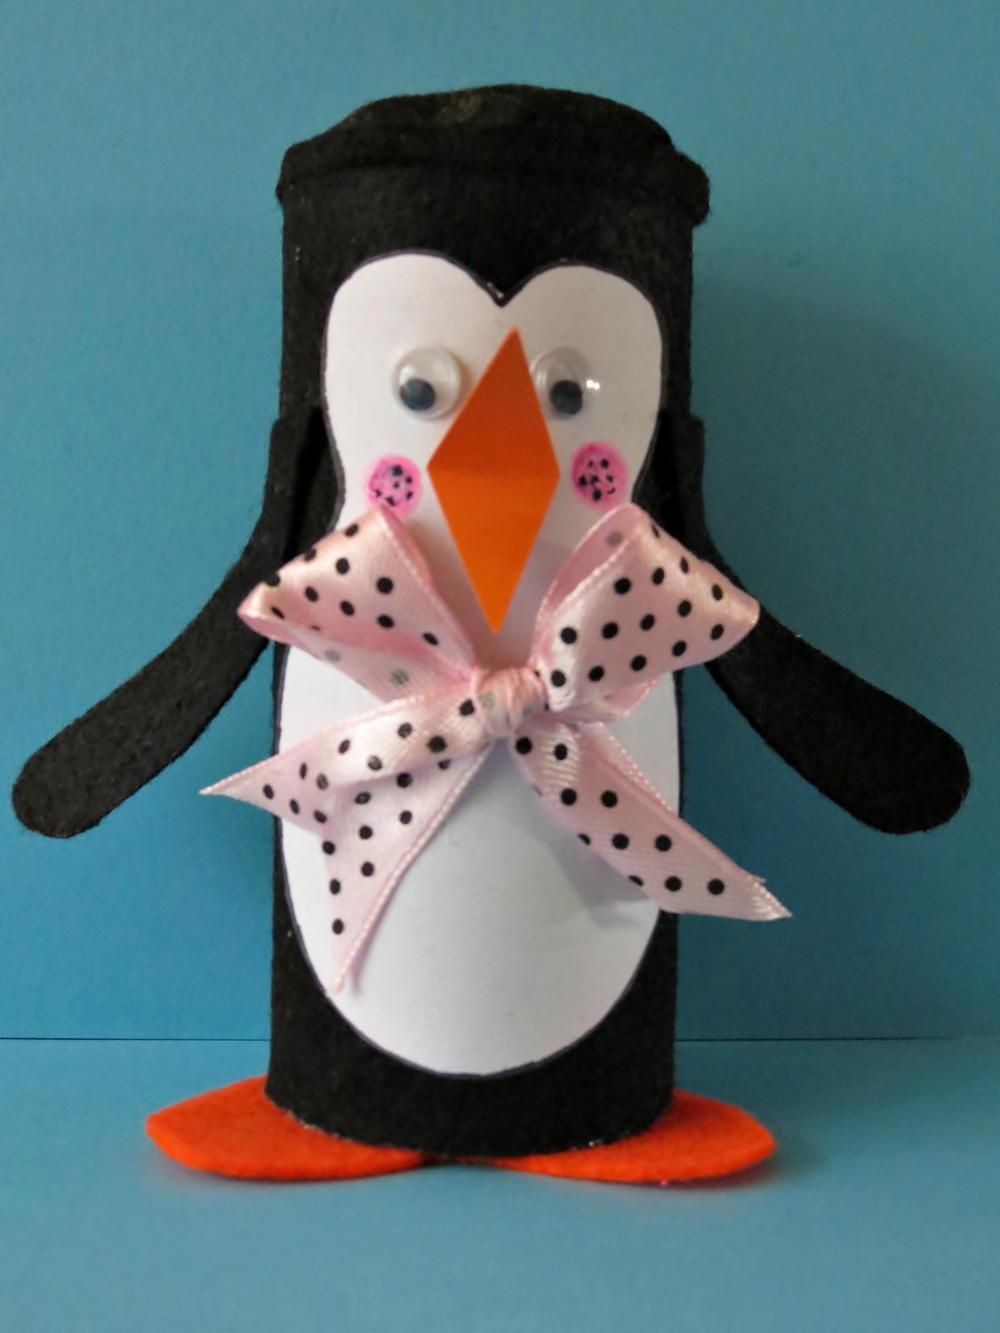 Winter Penguin Toilet Paper Roll Craft Favecrafts Com